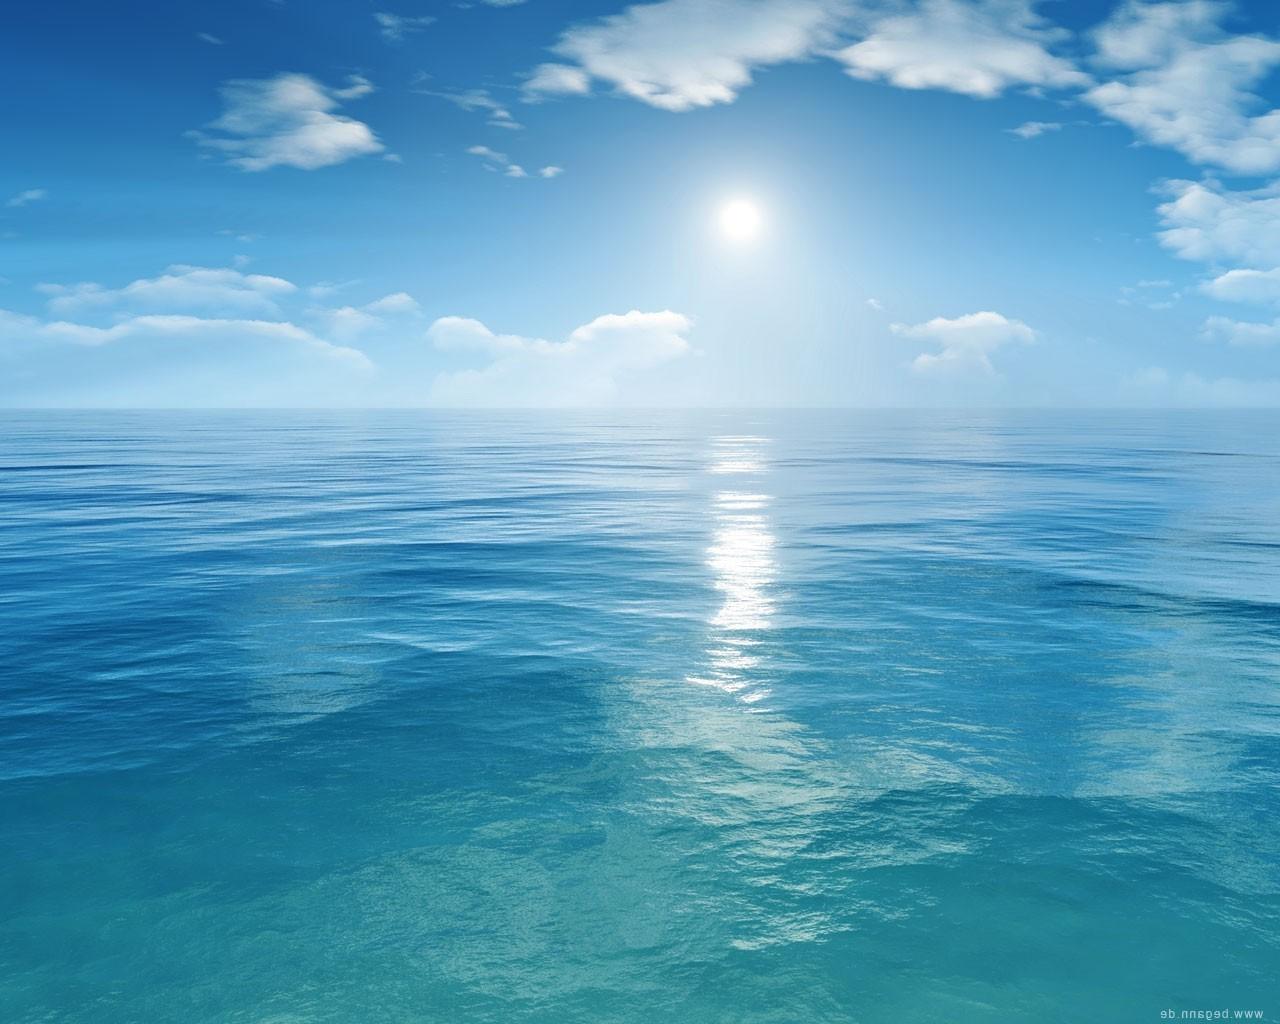 океан в картинках слайд шоу можем